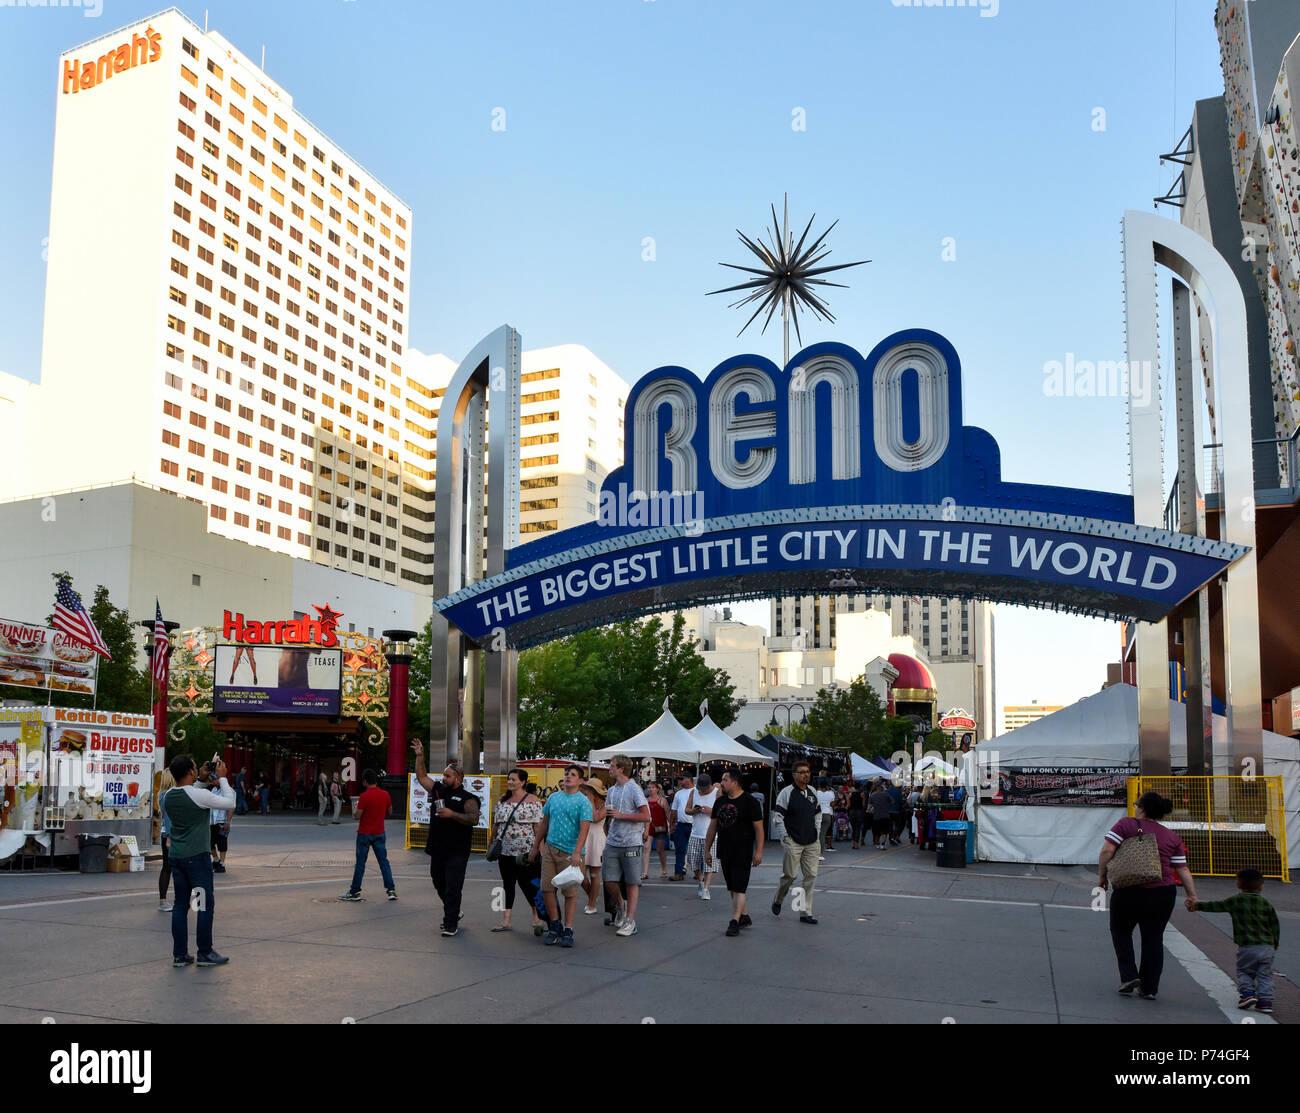 Reno Nevada skyline - Stock Image